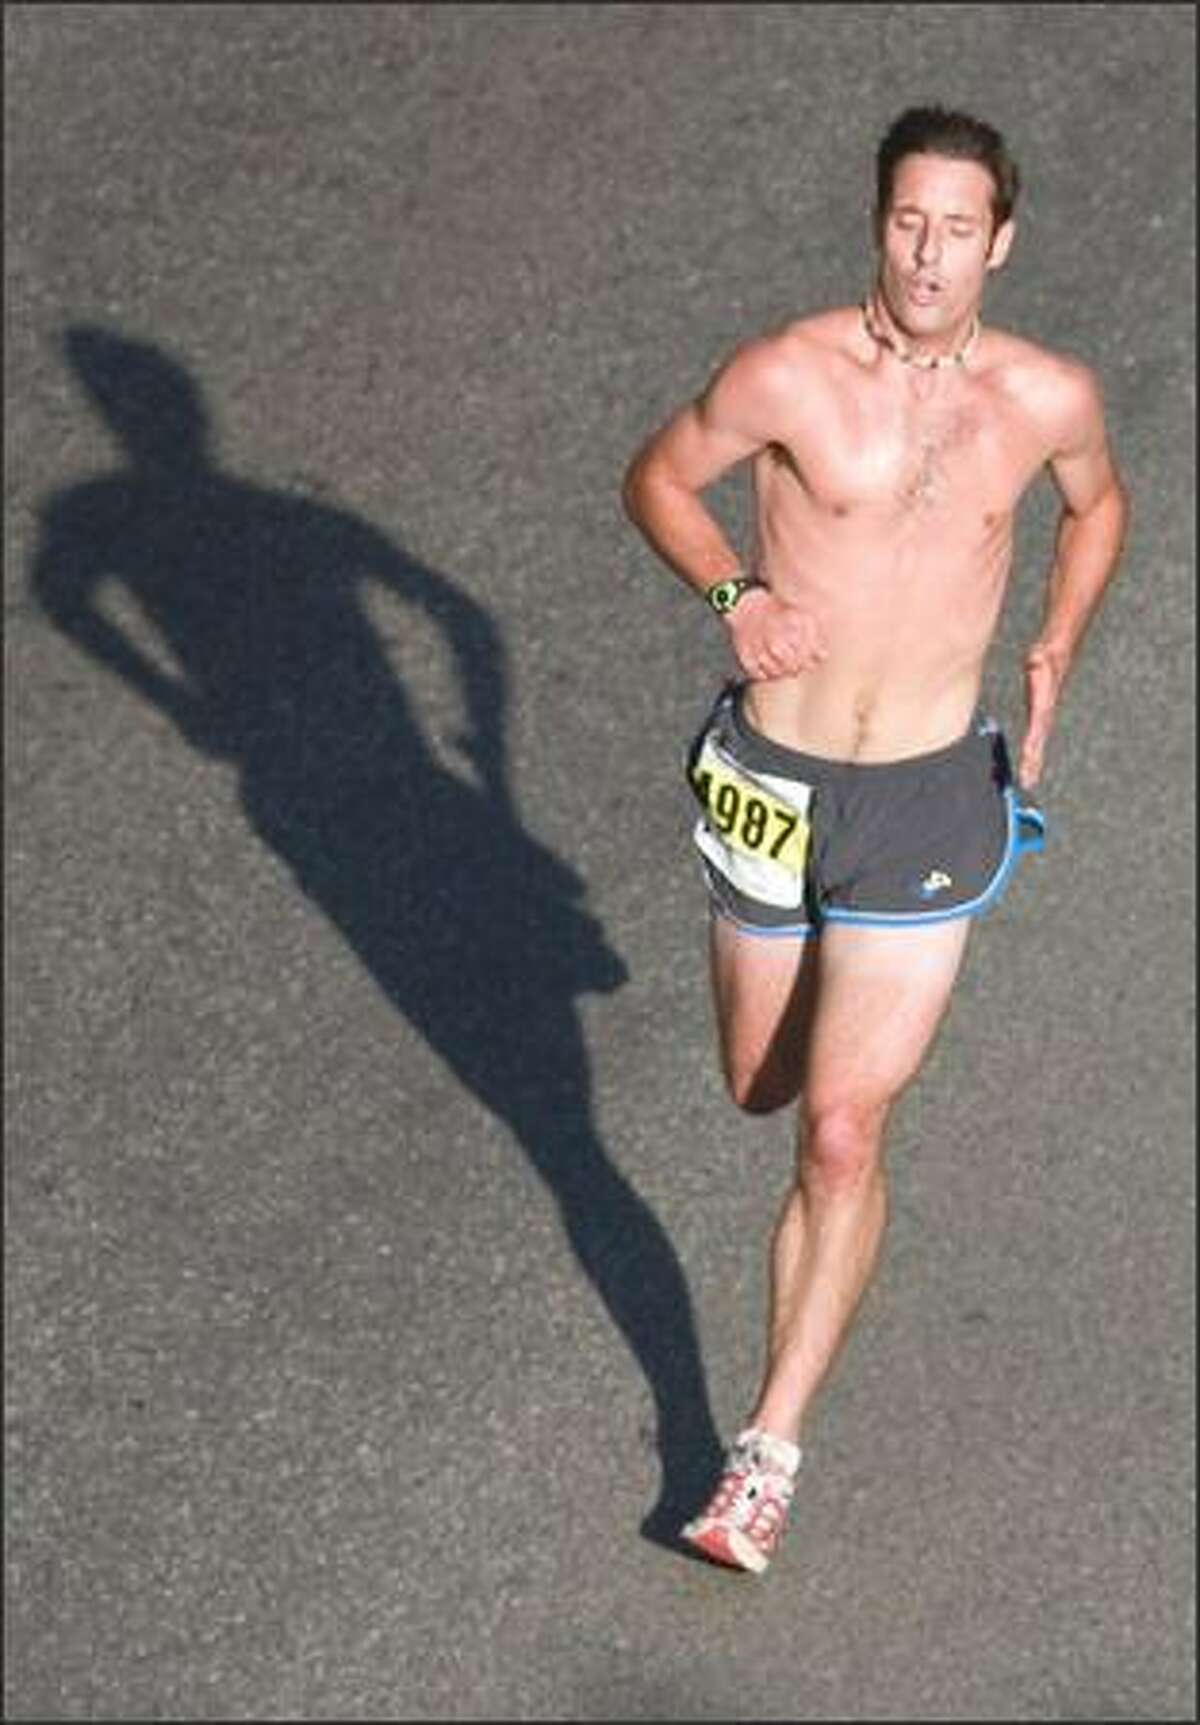 A runner casts his shadow on 520 during the Virginia Mason Team Medicine Seafair Marathon.